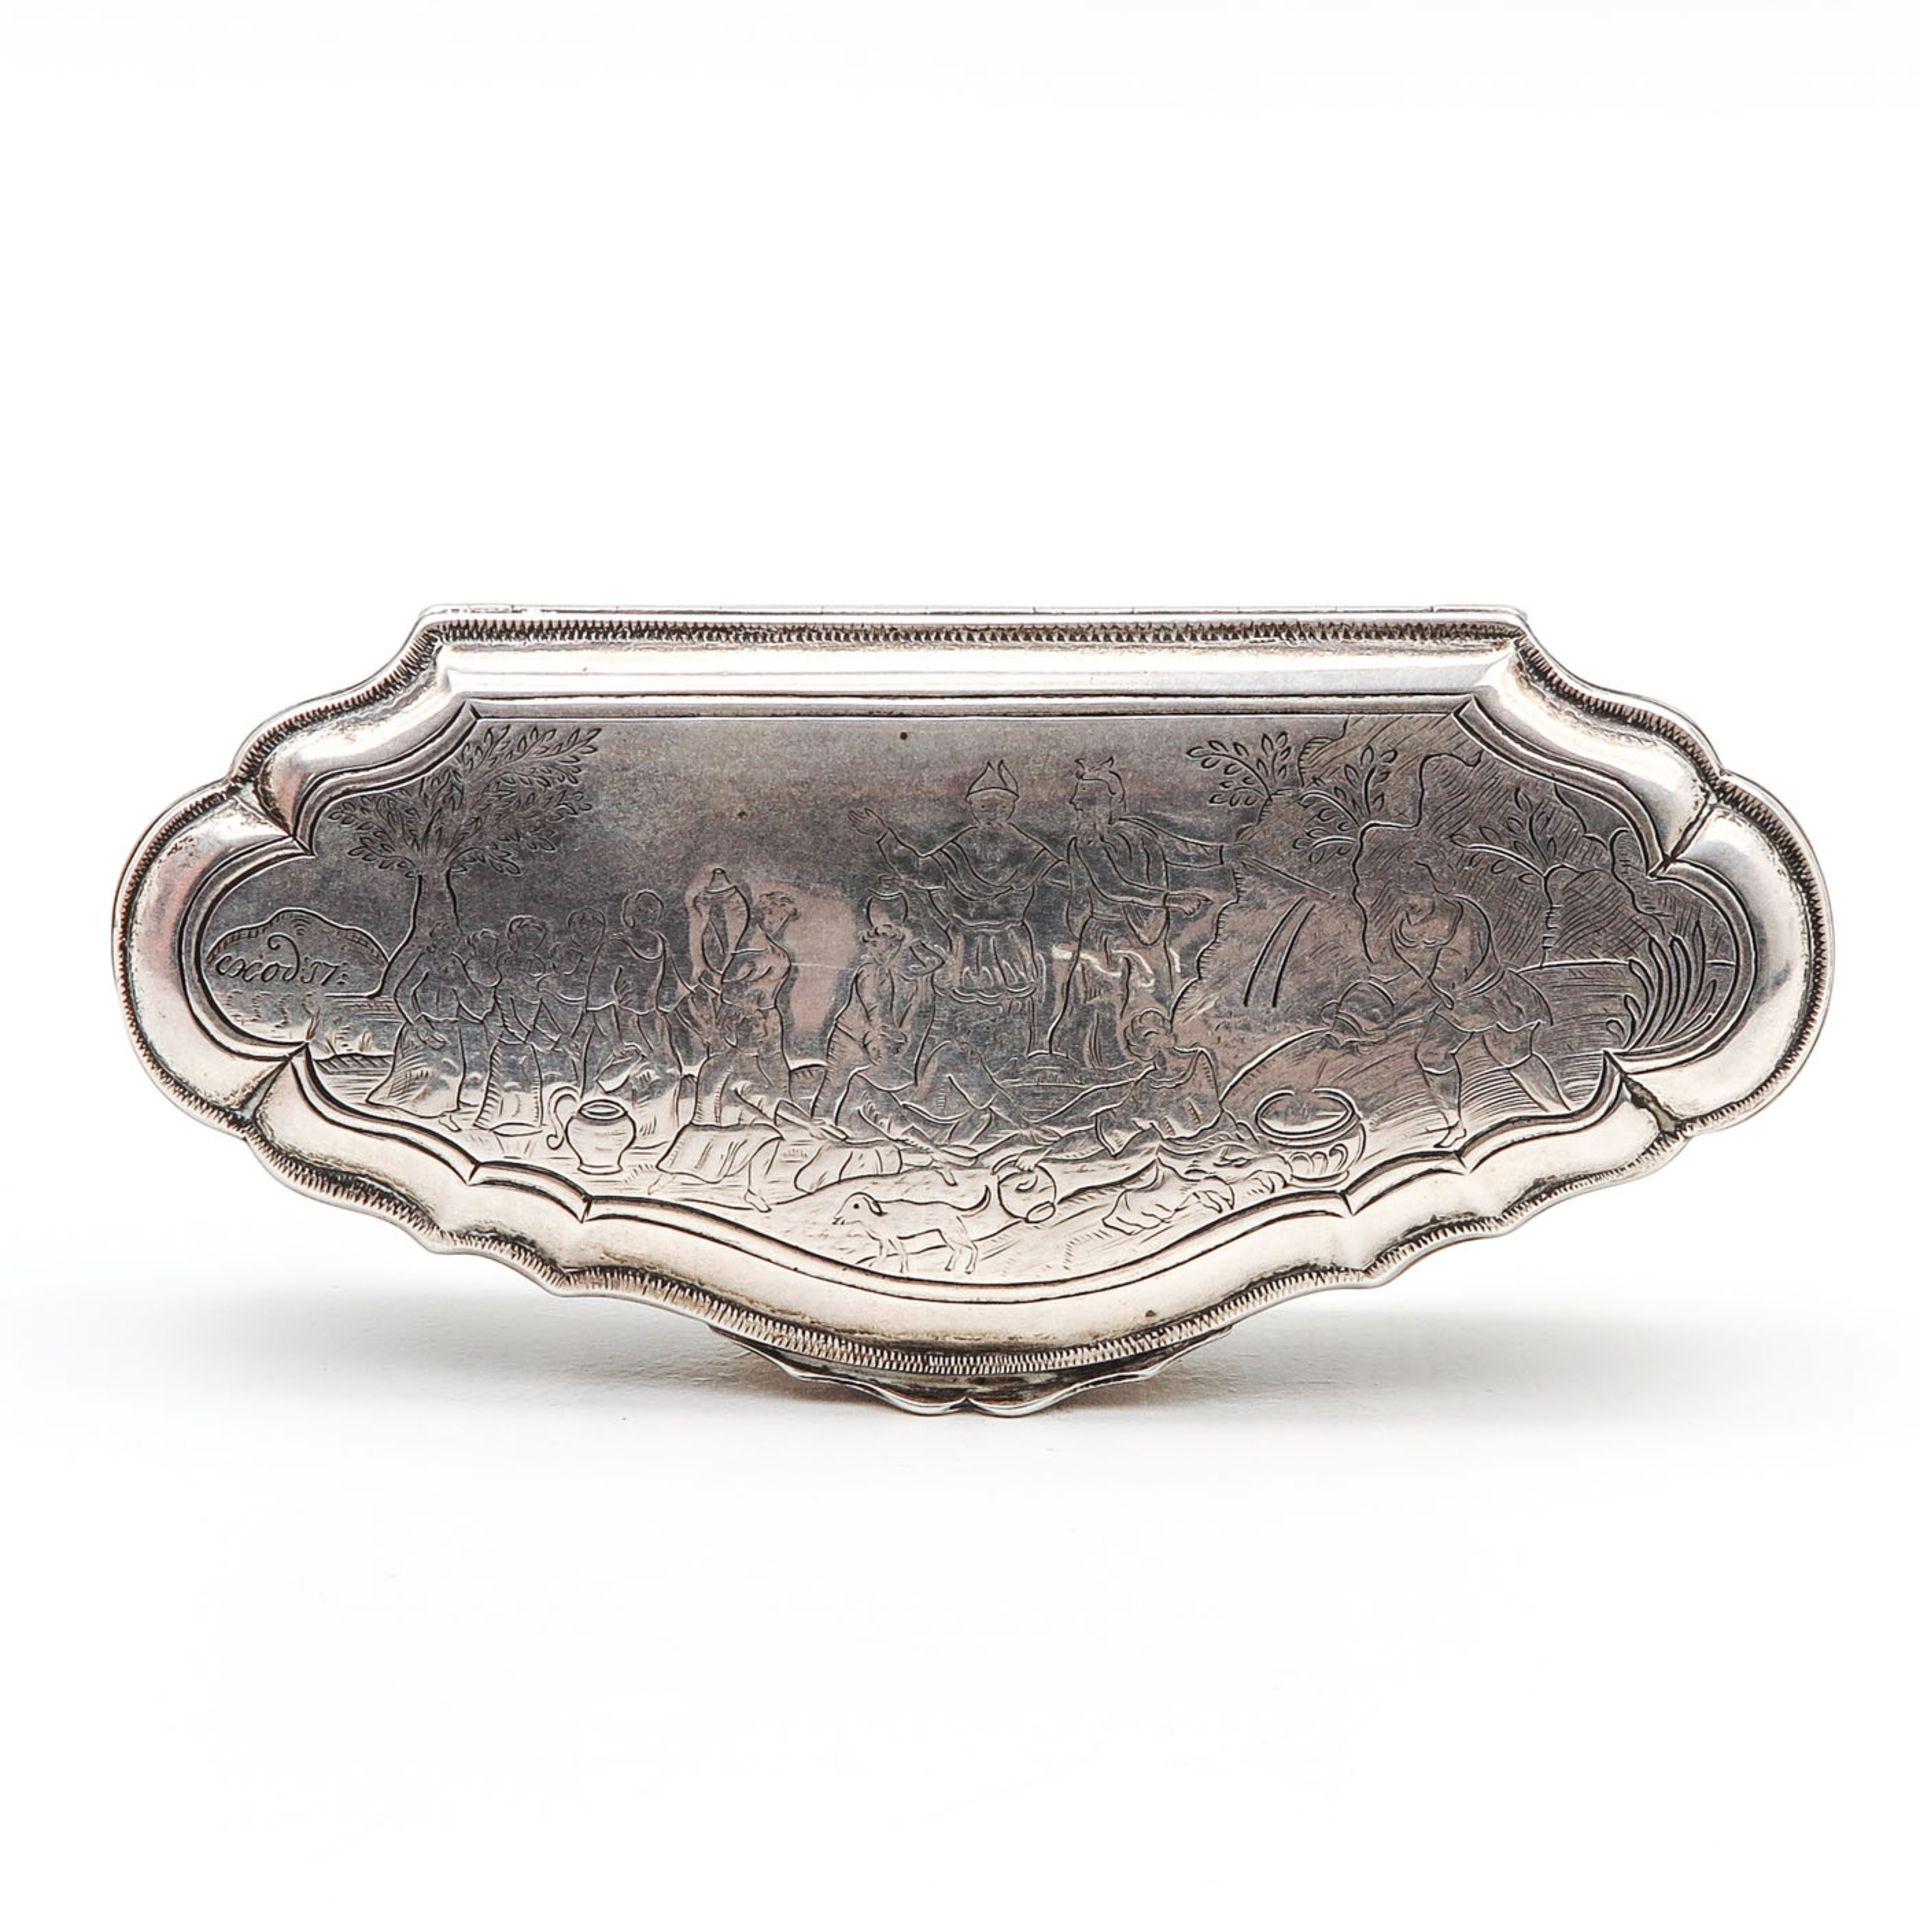 Los 3024 - An Dutch Silver Tobacco Box